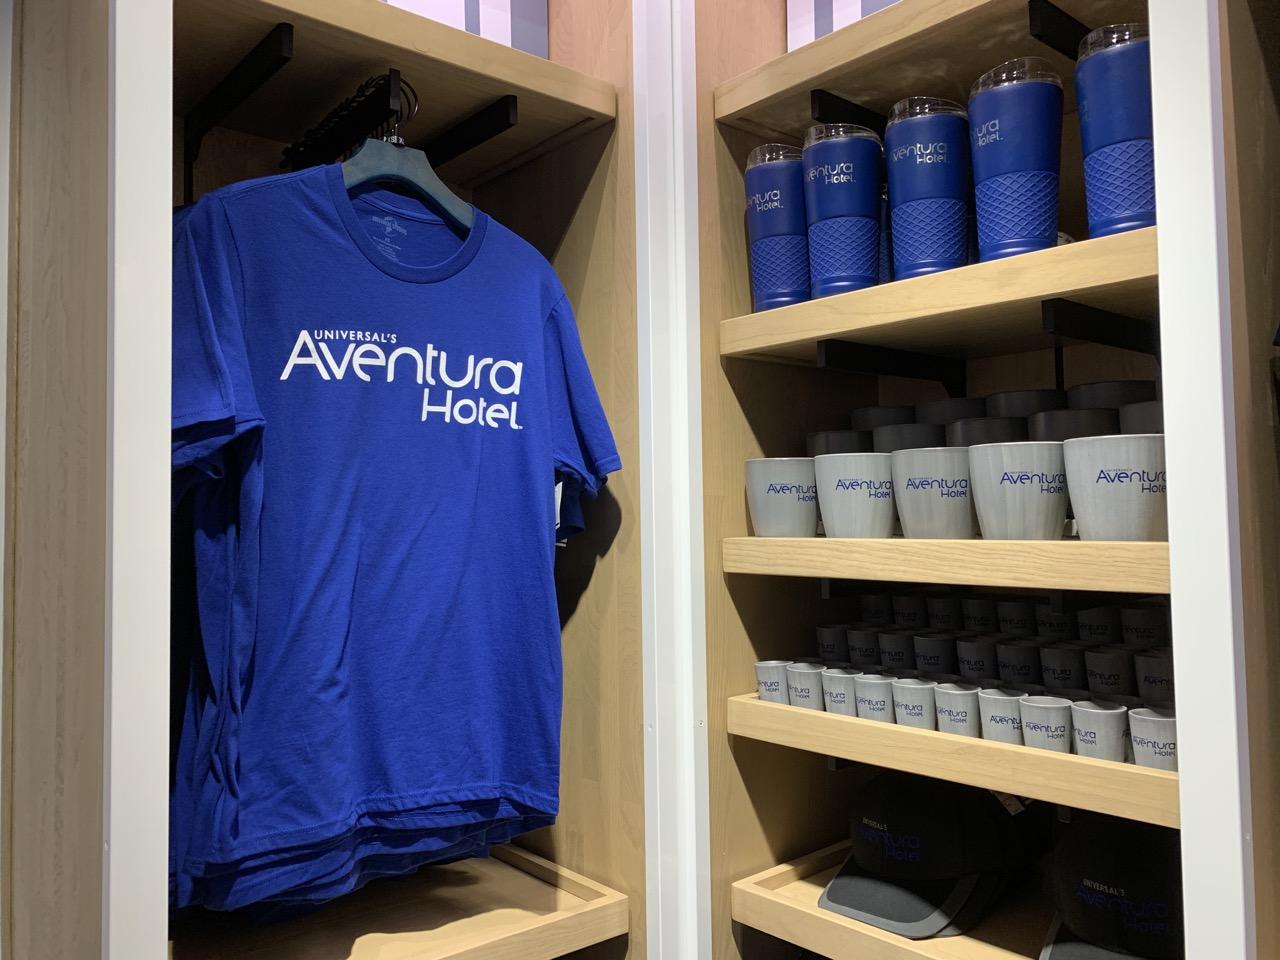 universal aventura hotel review store 3.jpeg